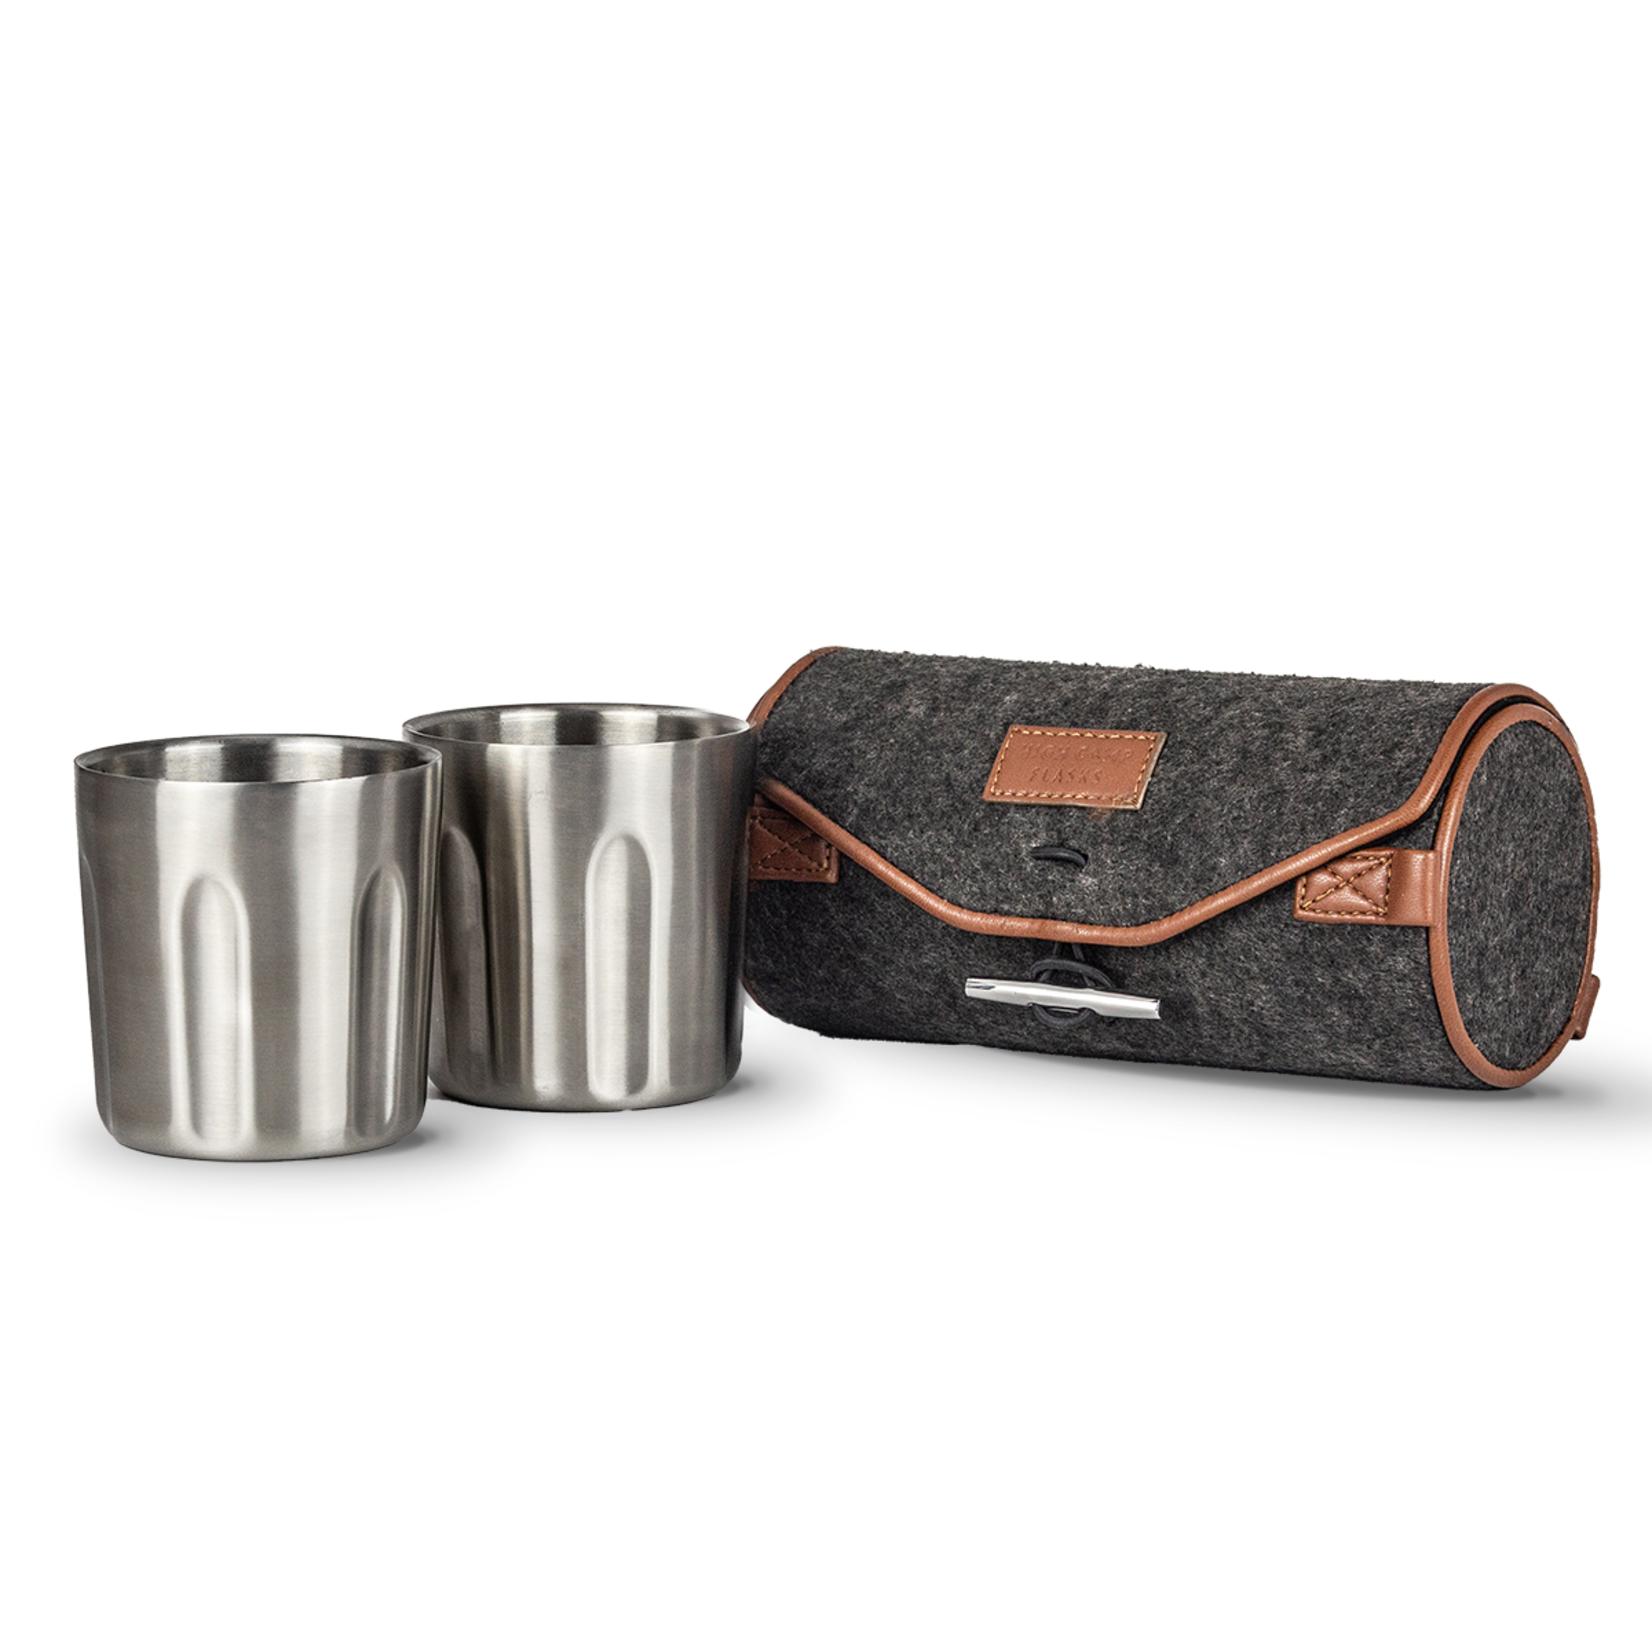 High Camp Flasks High Camp Flasks Tumbler 2-Pack + Soft Wool Felt Carrying Case - Stainless Steel